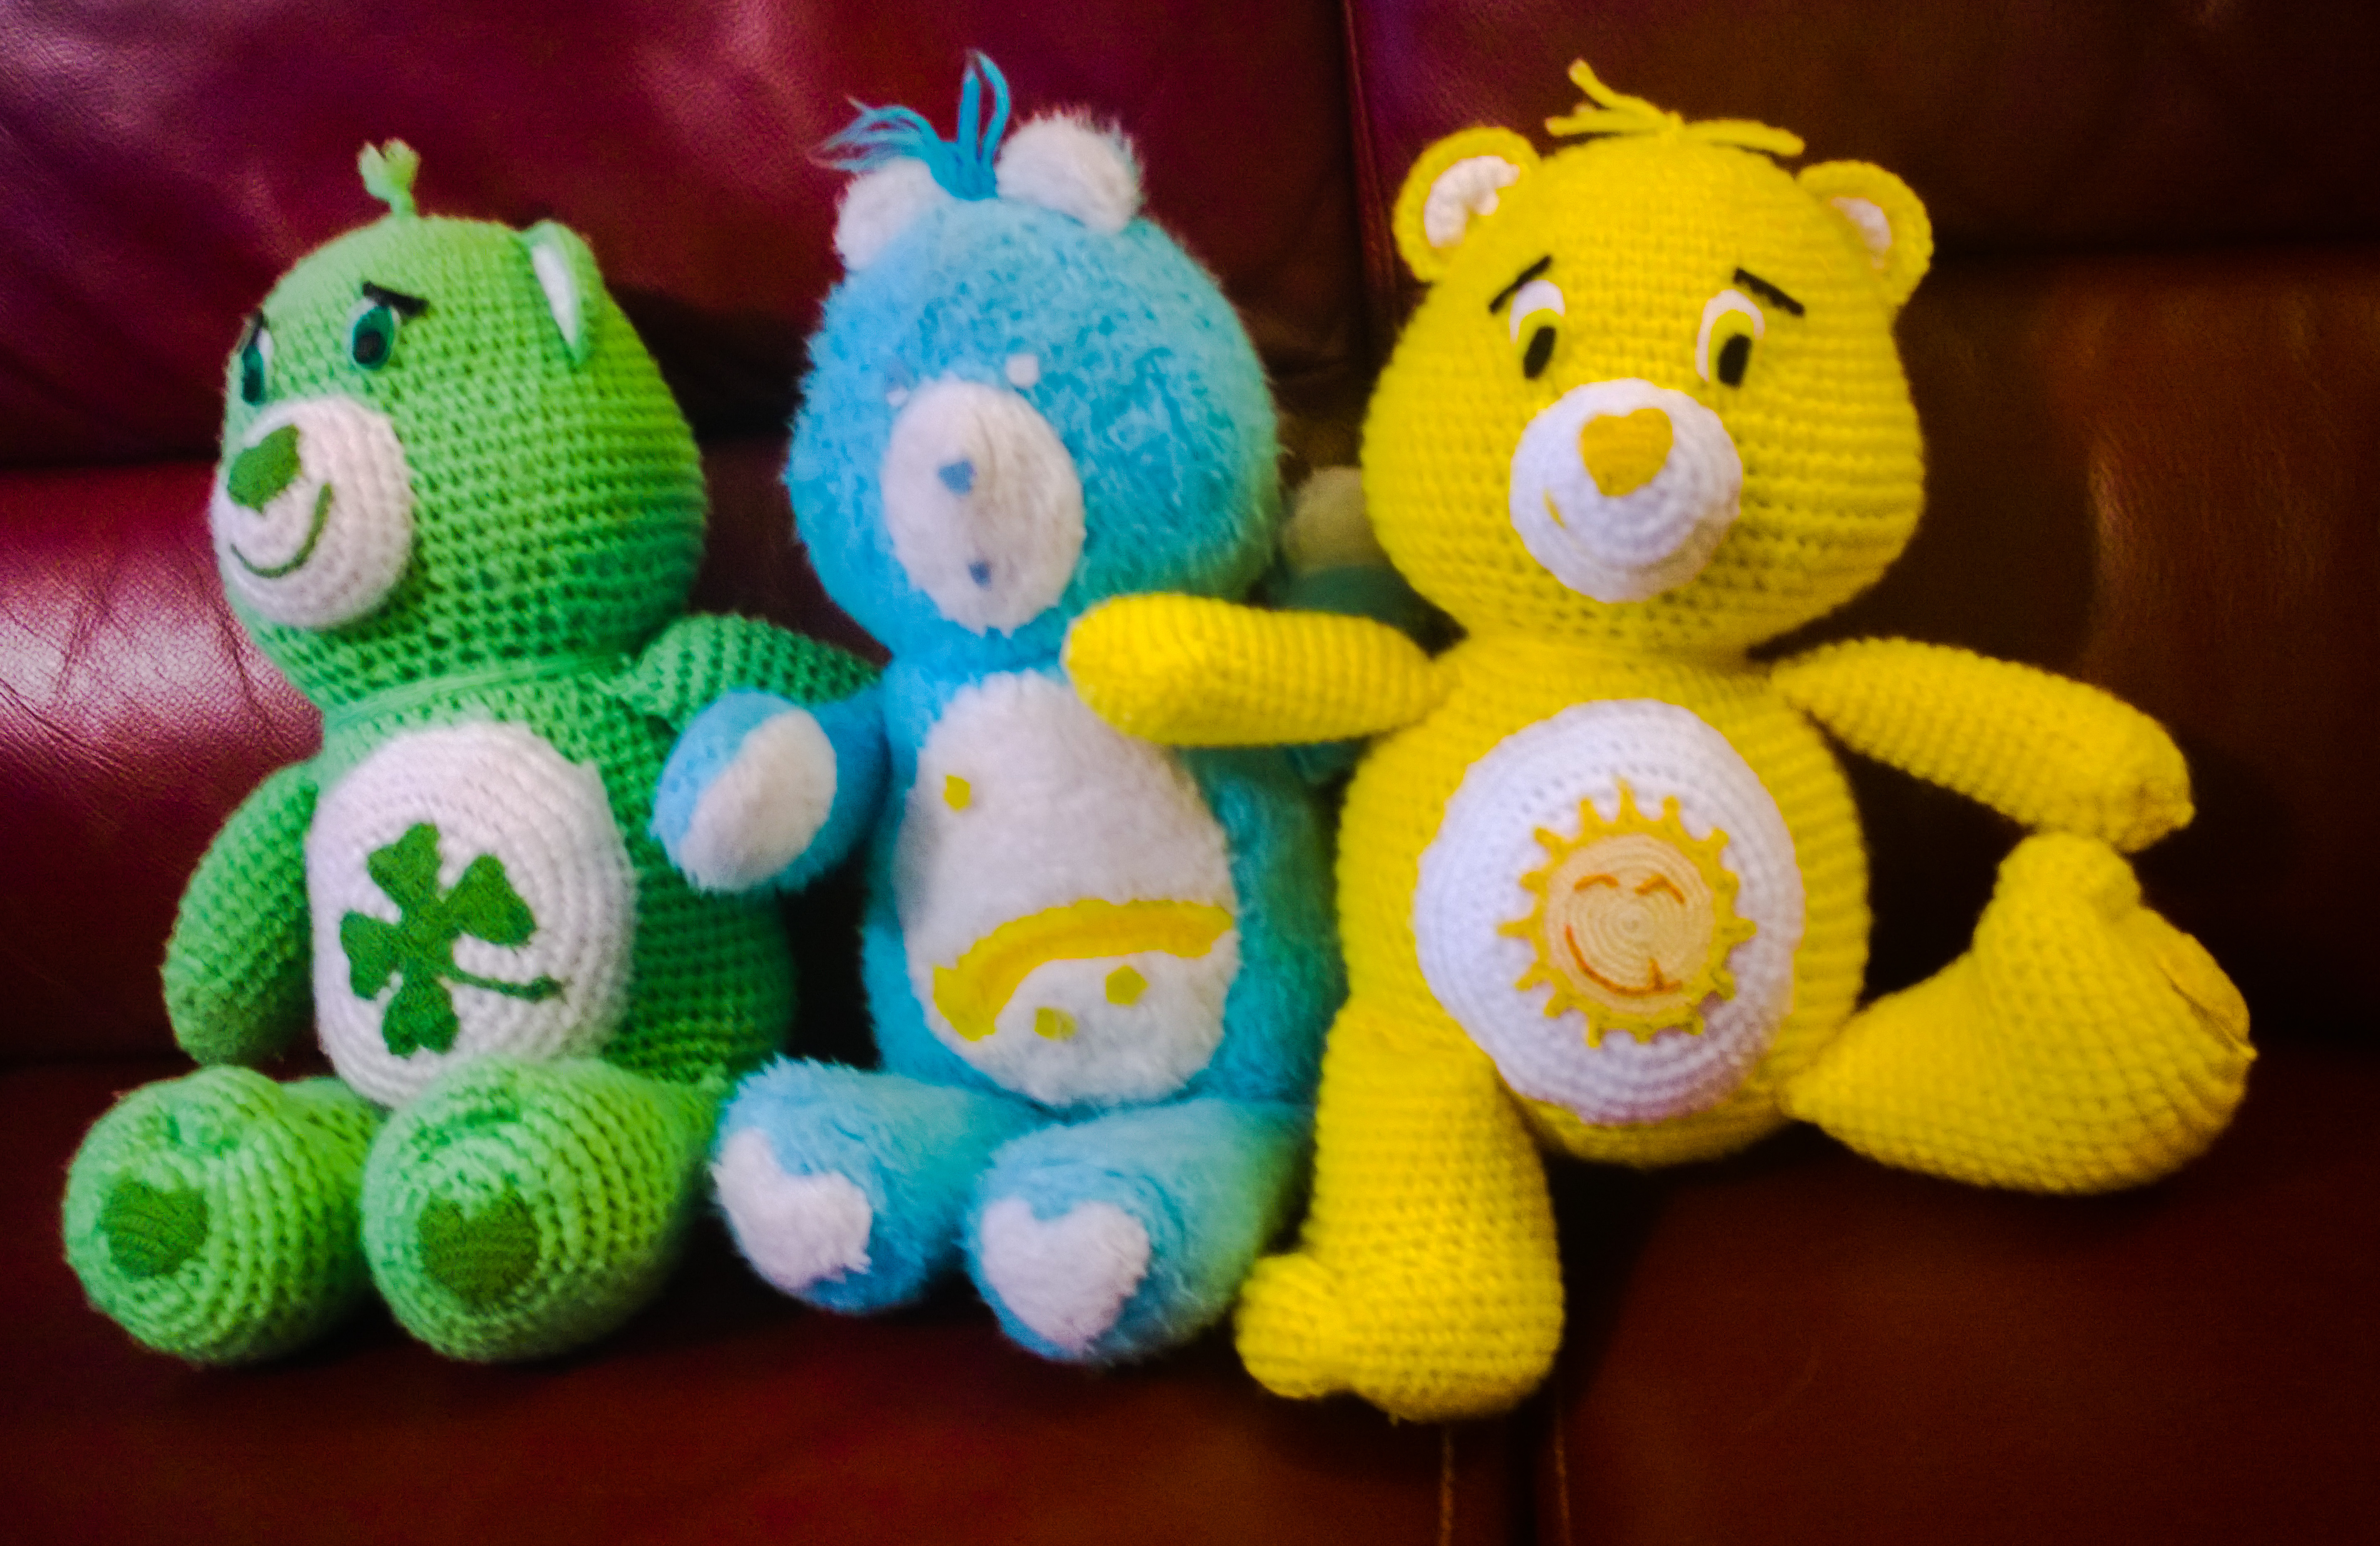 crochet pattern | mnprairiecrafts